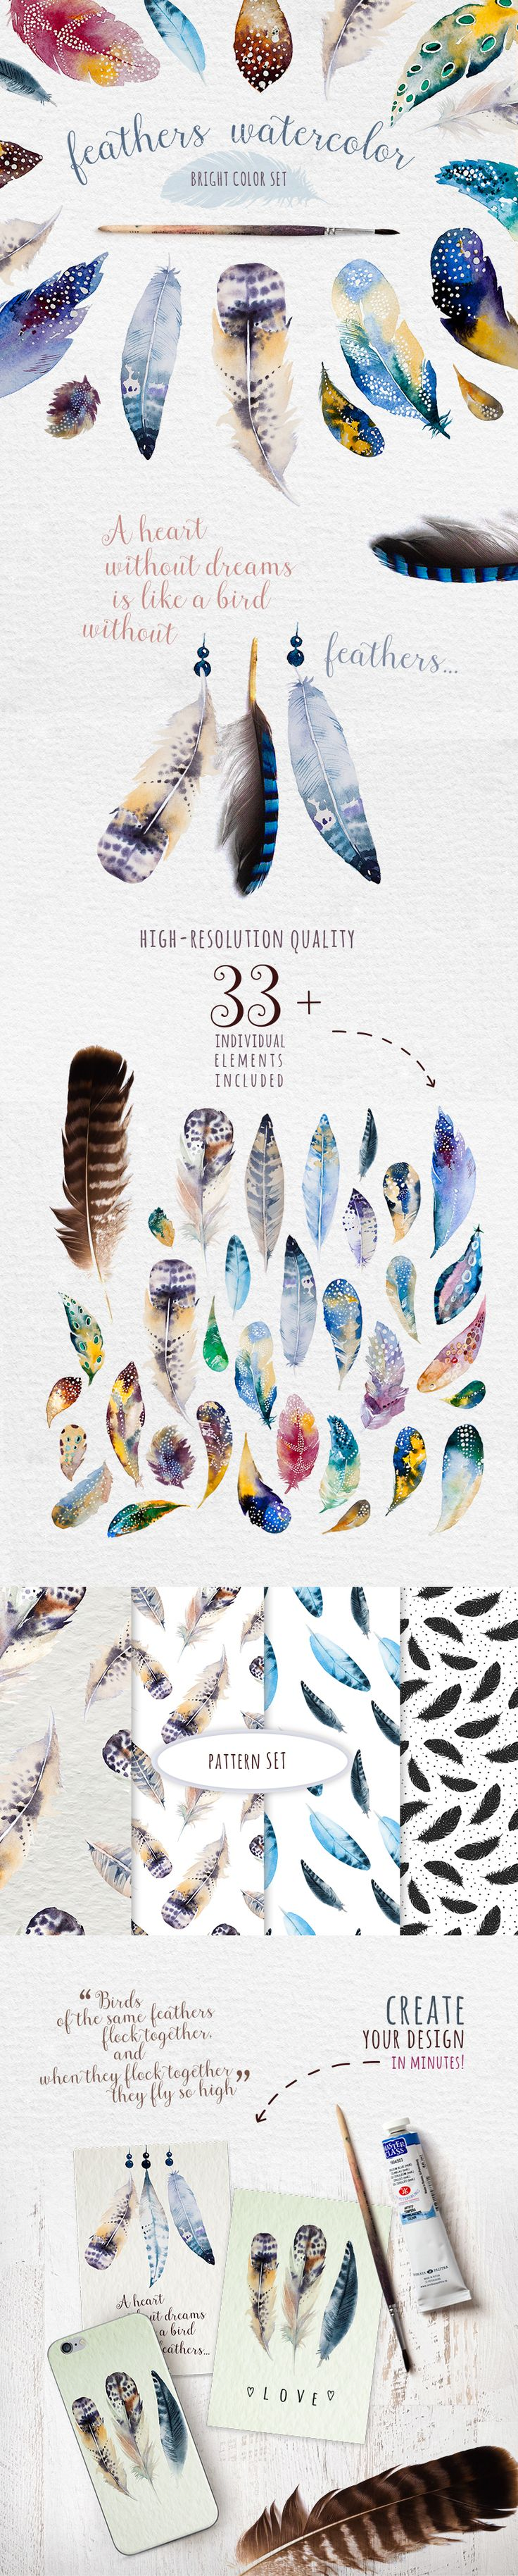 Watercolor feathers setAvailable for sale here:                             https://creativemarket.com/Kris_peace/333218-Watercolor-feather-DIY?u=Kris_peace